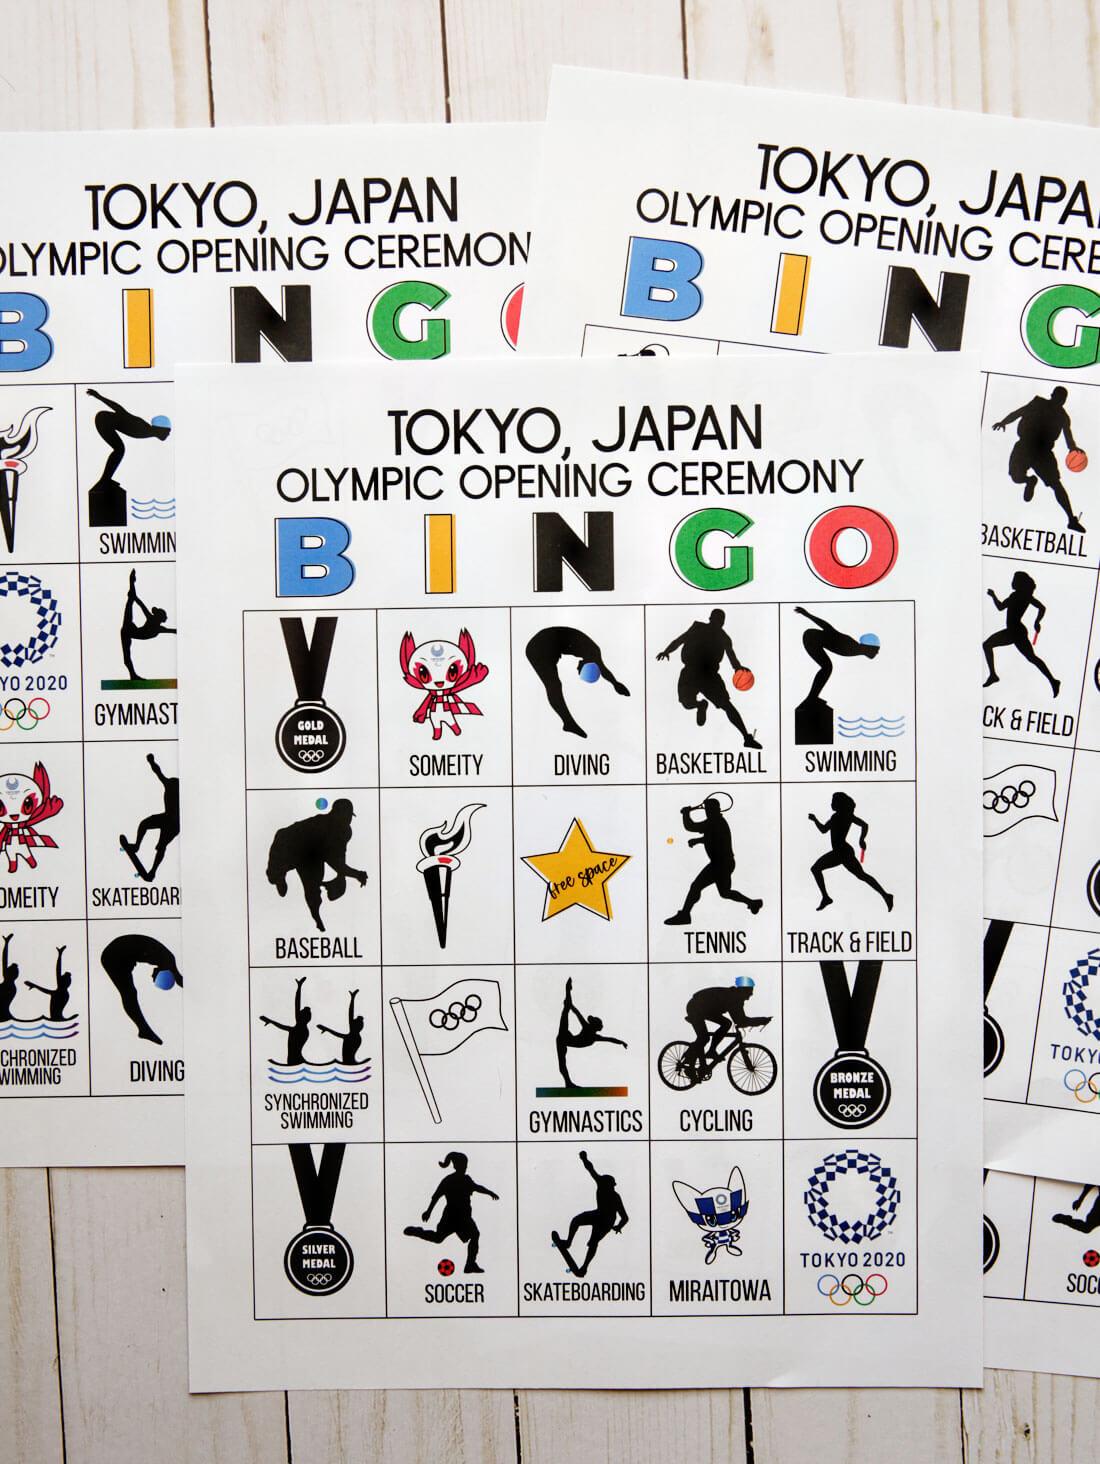 Olympics Opening Ceremony 2012 - Tokyo Olympics Opening ...